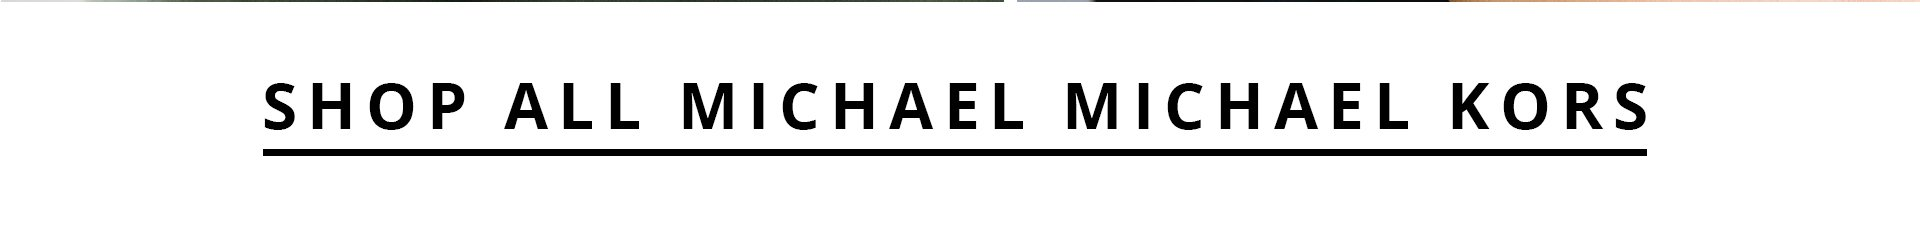 Shop All MICHAEL Michael Kors